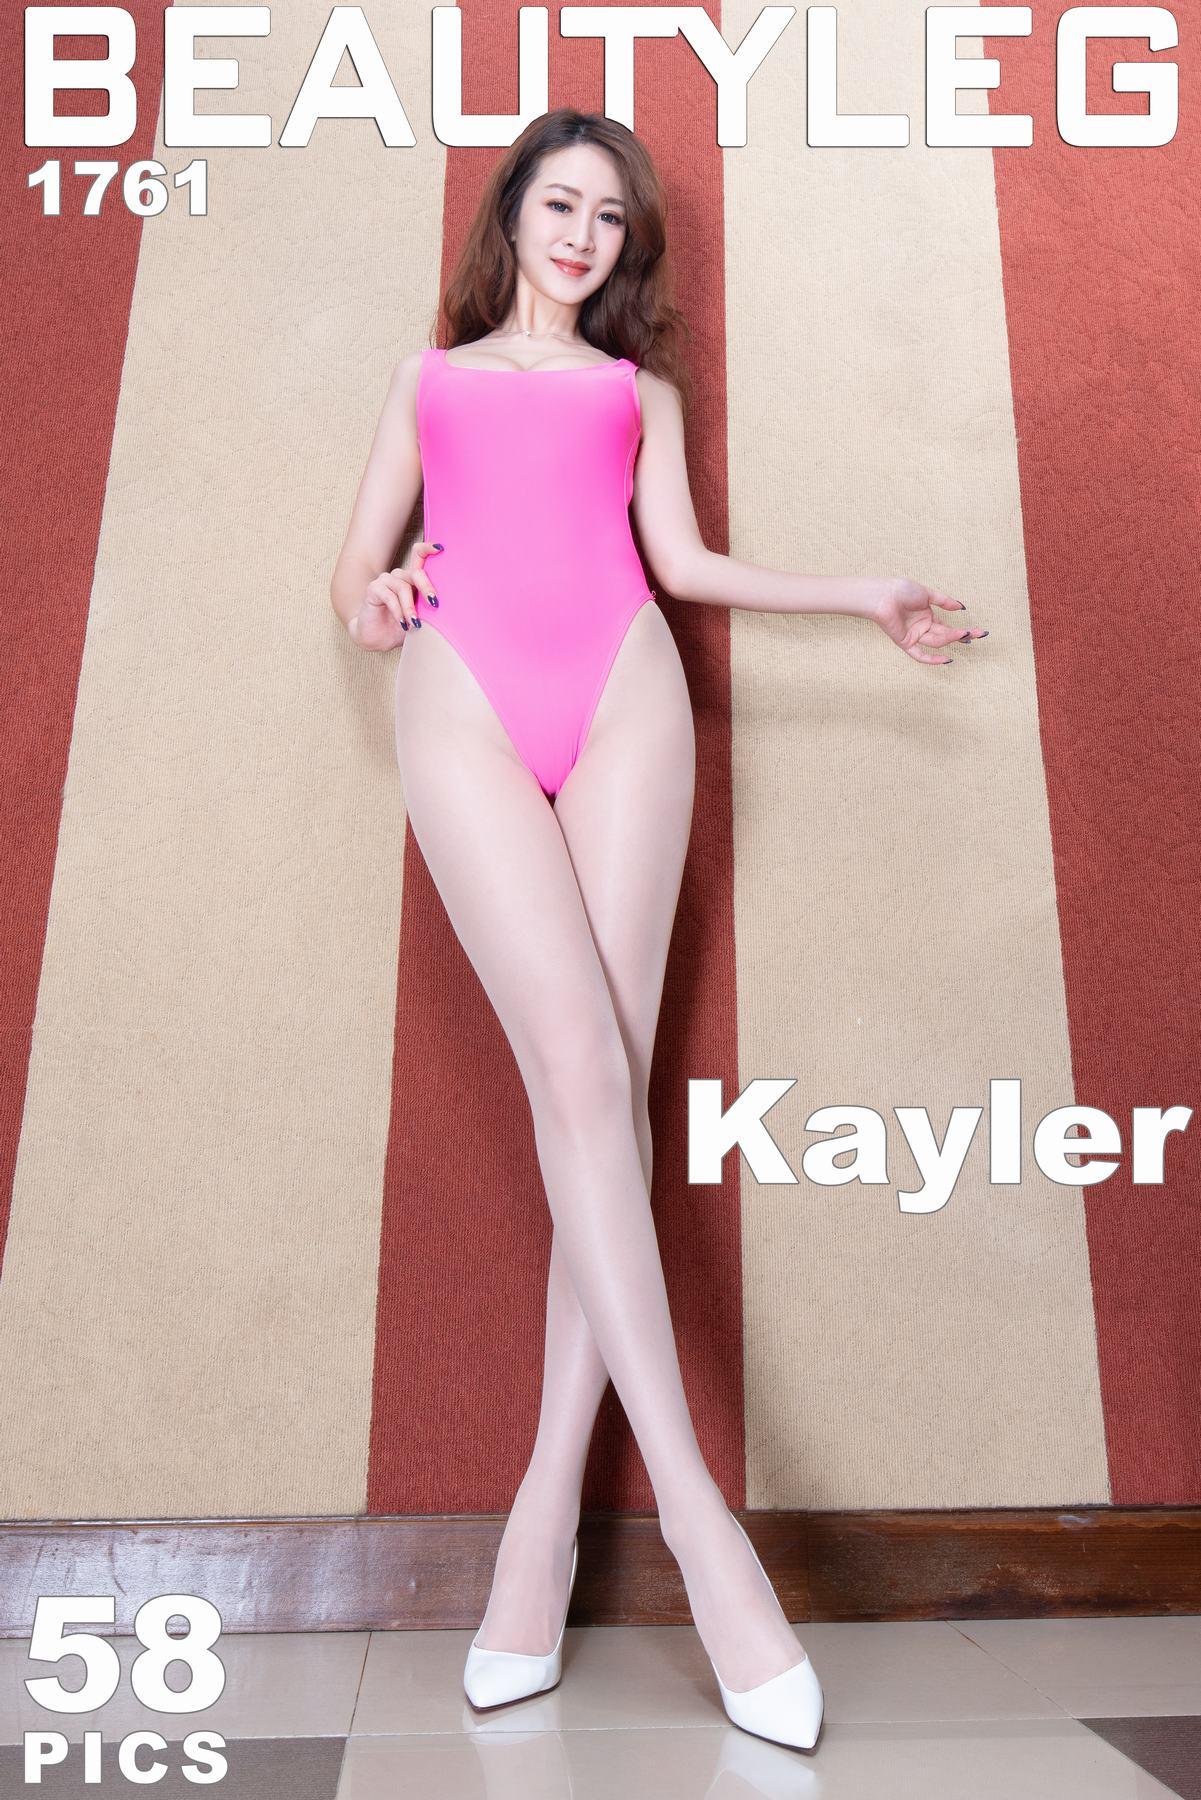 [Beautyleg]美女写真图片 2019.05.06 No.1761 Kaylar